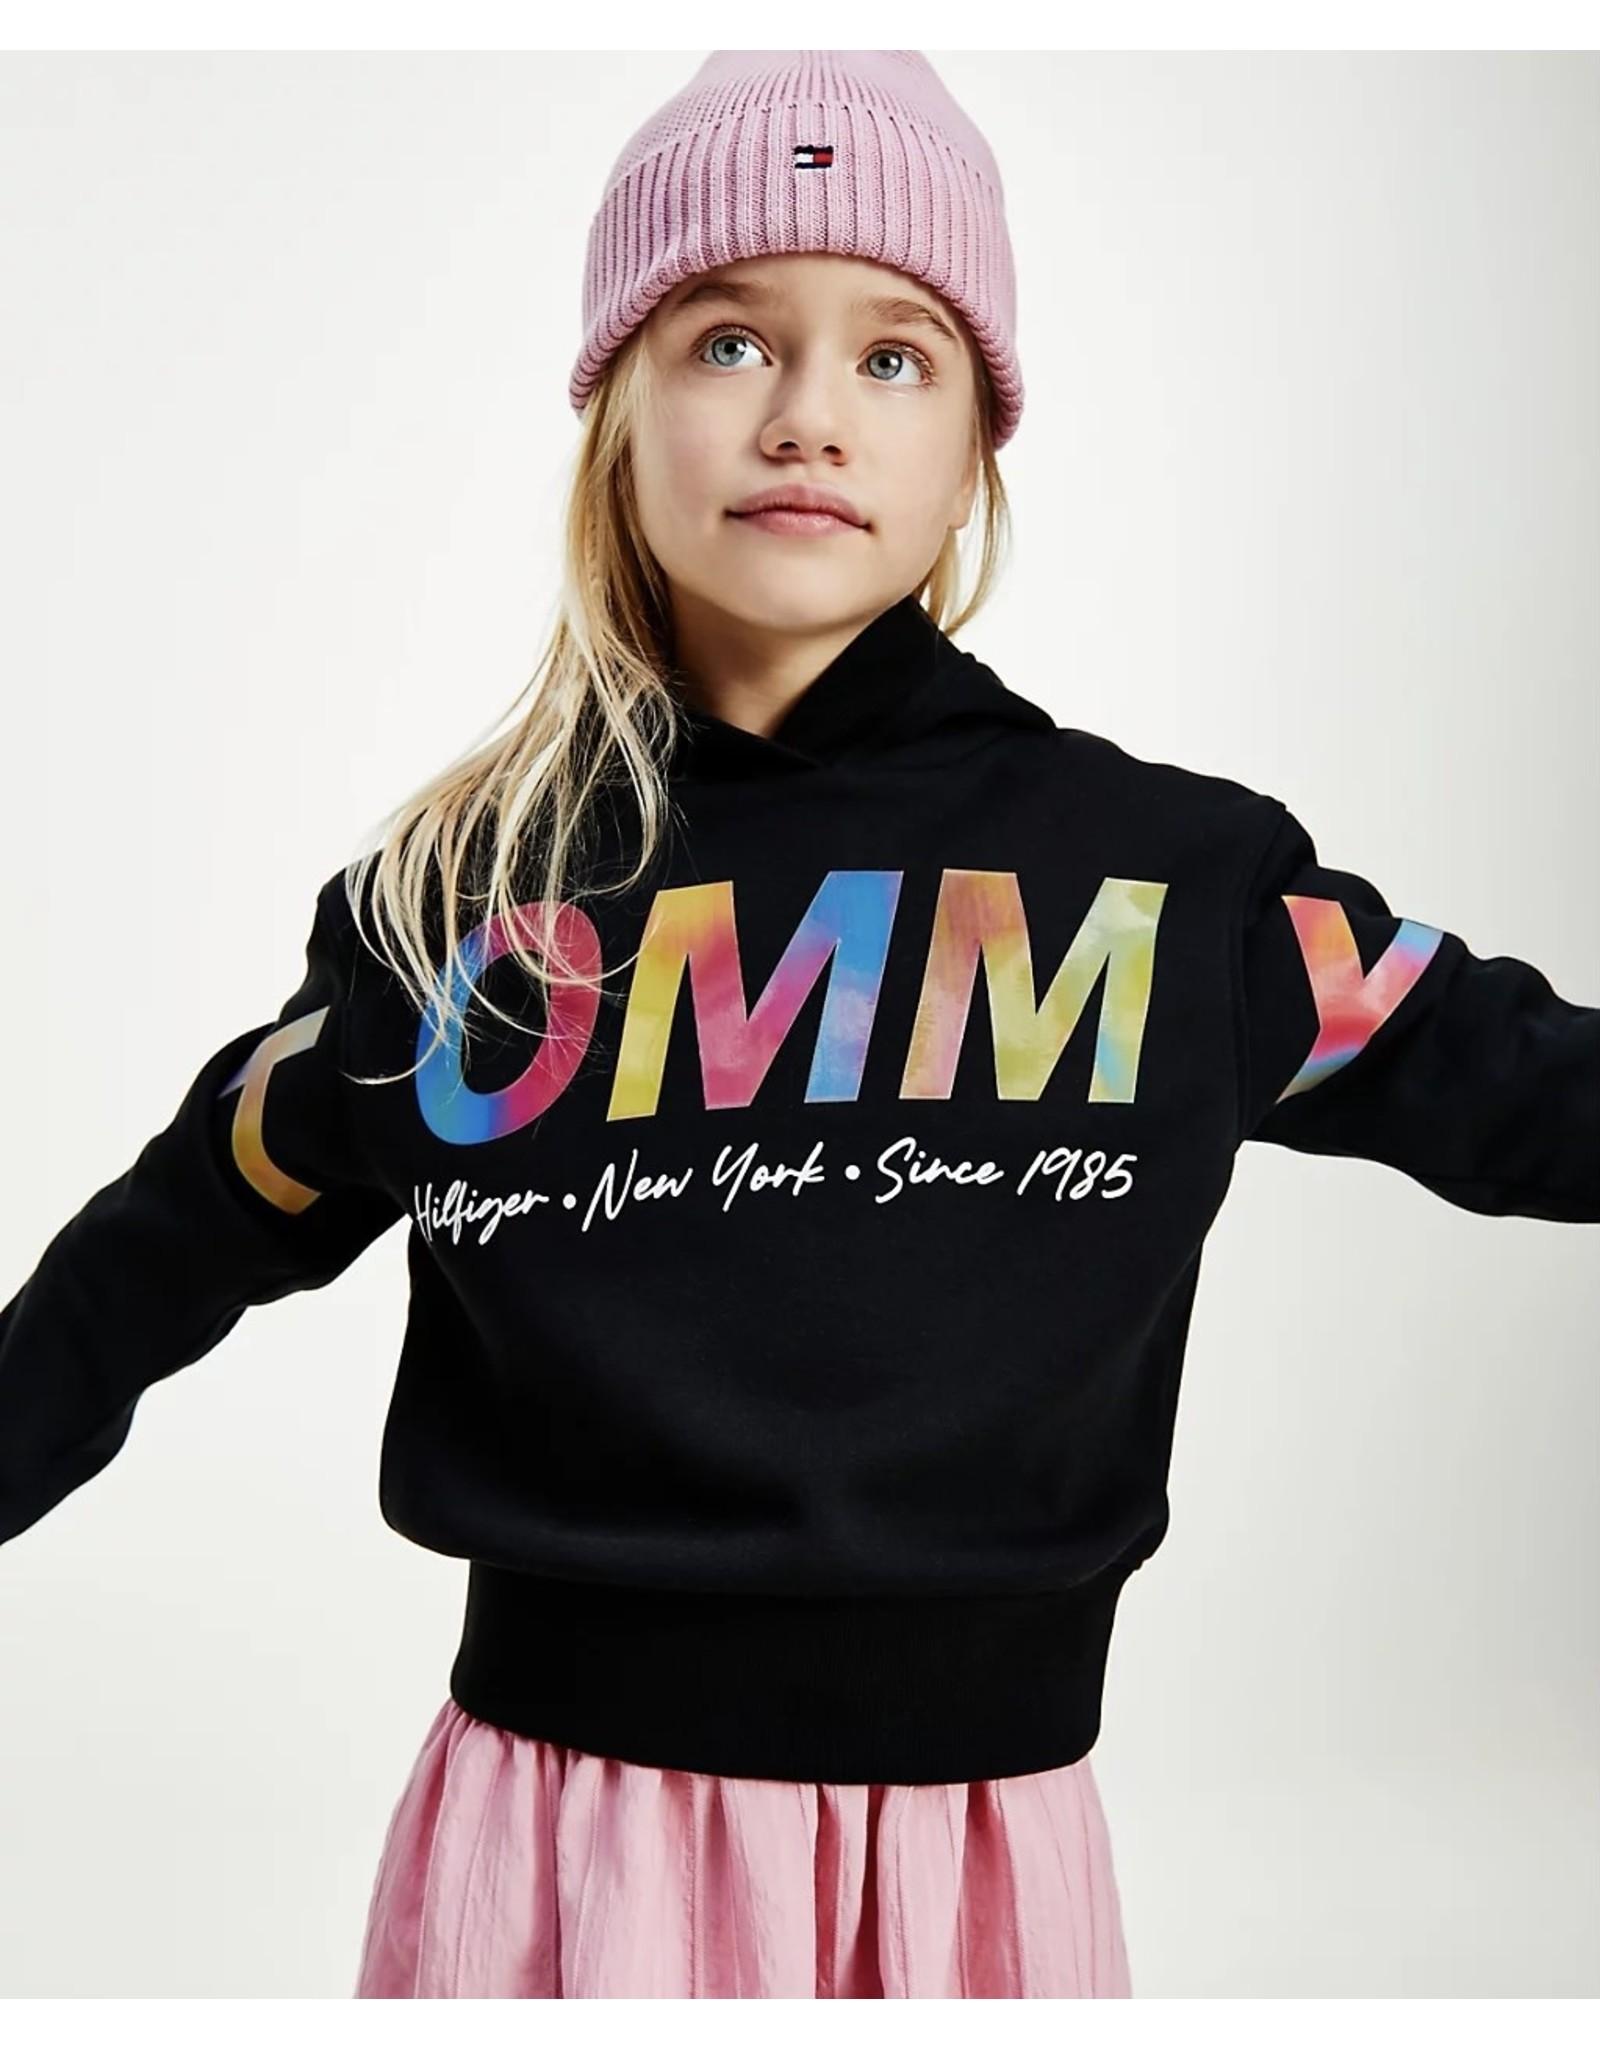 Tommy Hilfiger 6160 Sweater